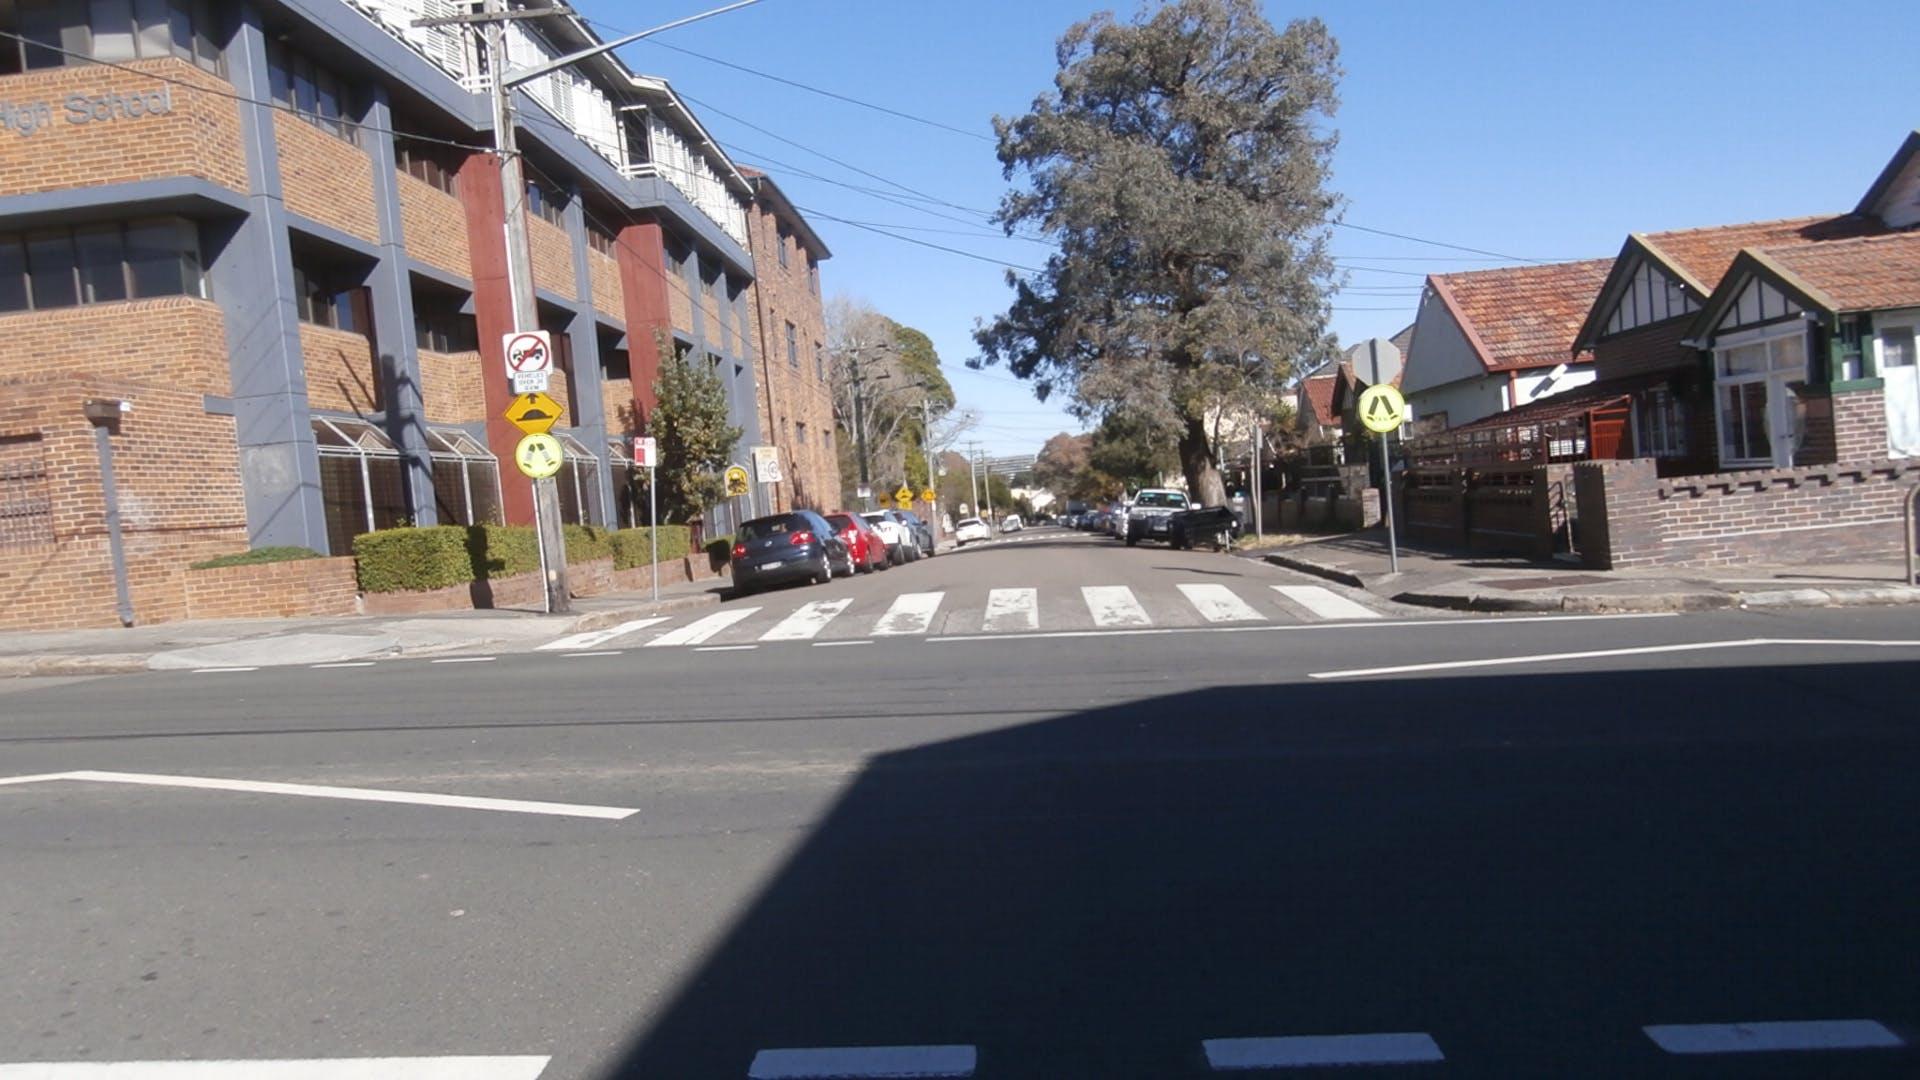 Denison Road Lewisham intersection near Toothill Street